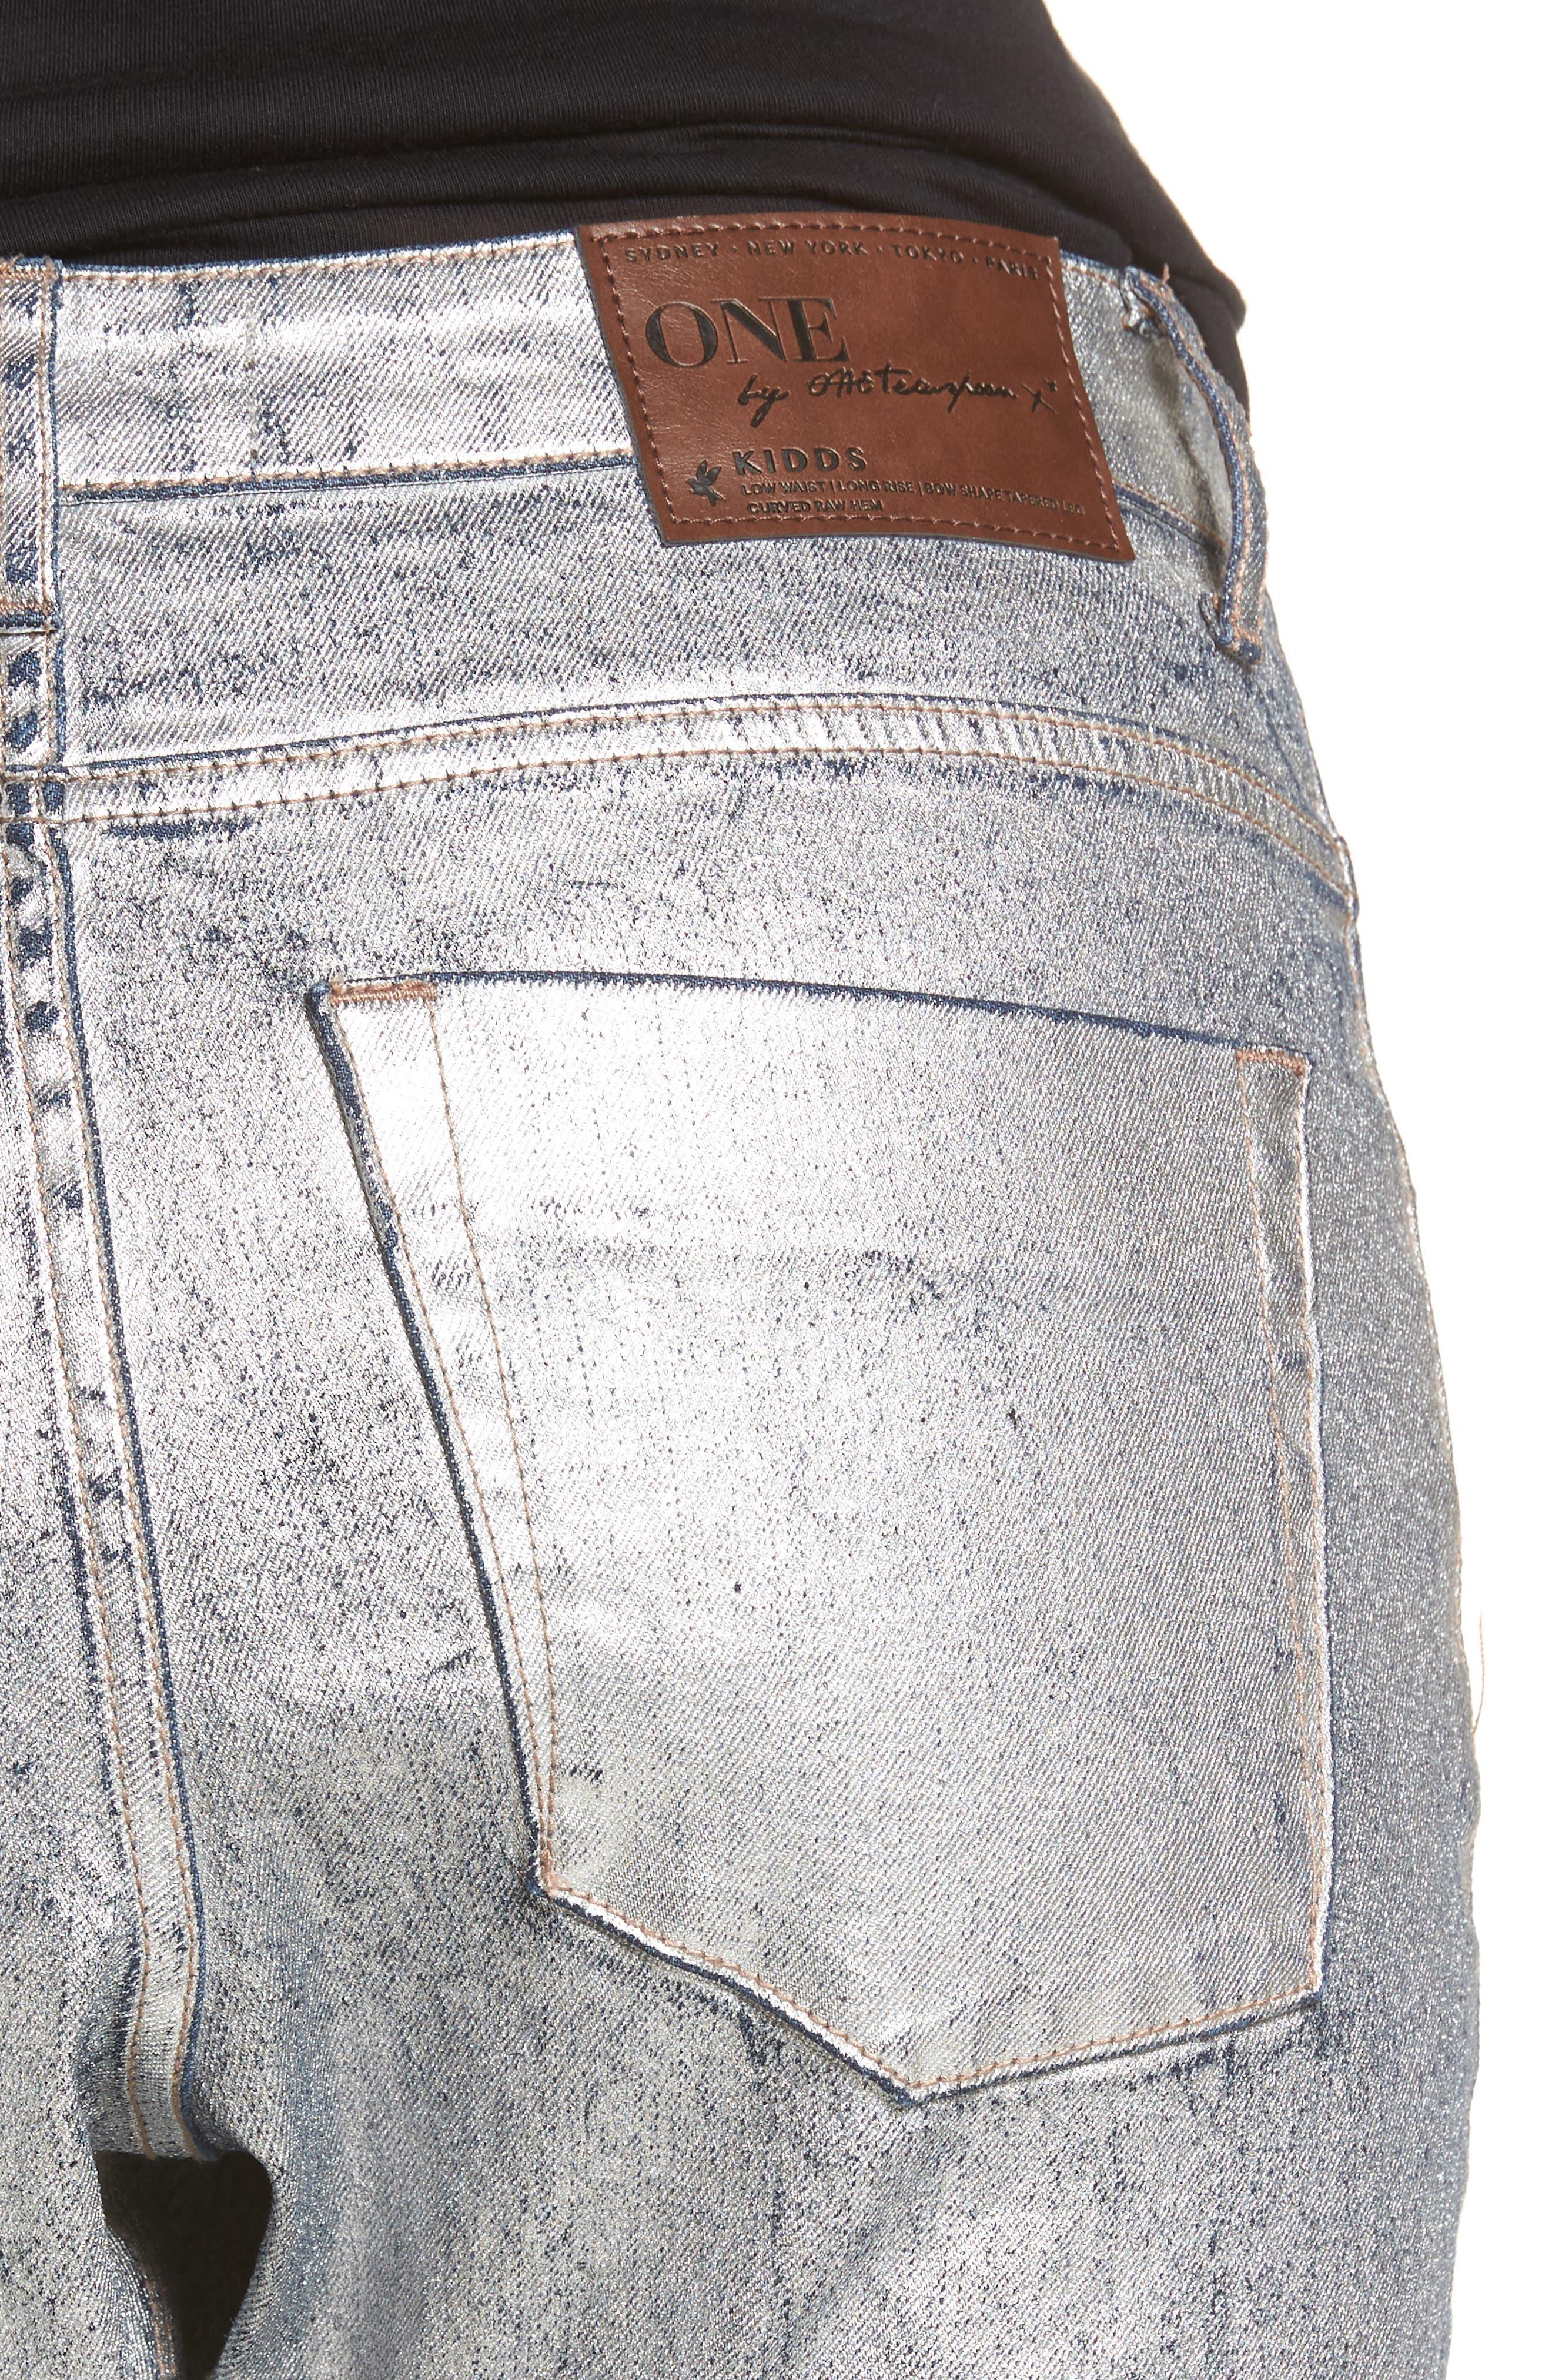 Kidds Metallic Drop Crotch Skinny Jeans,                             Alternate thumbnail 4, color,                             Nightshade